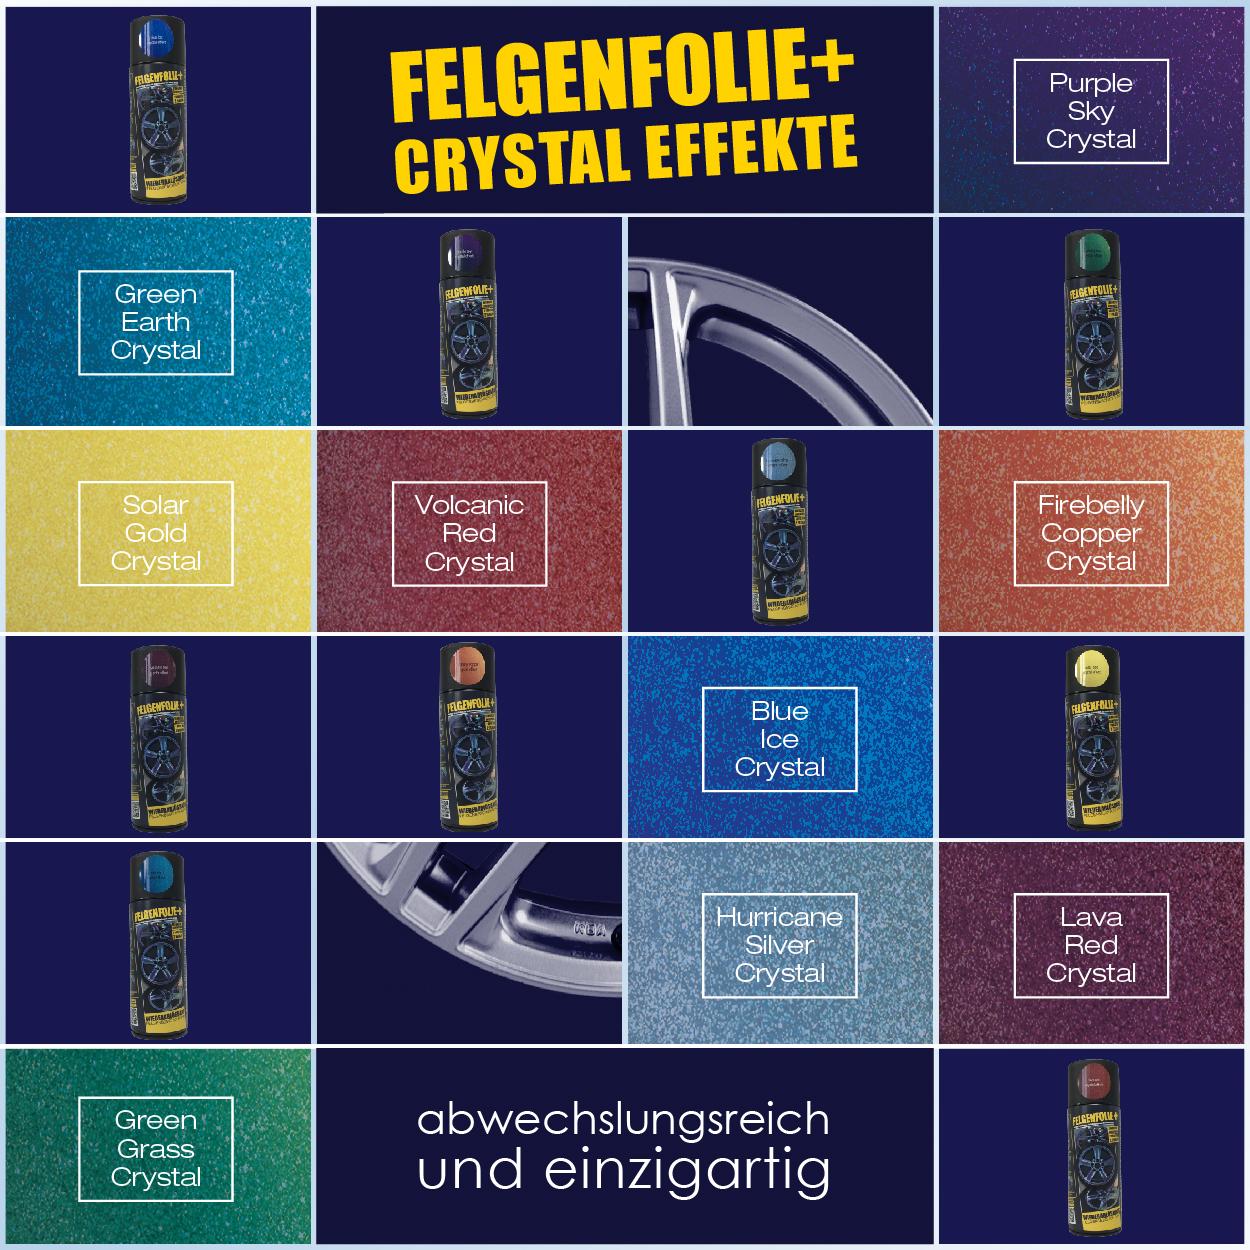 FELGENFOLIE+ Crystal Effekt Sprühfolie